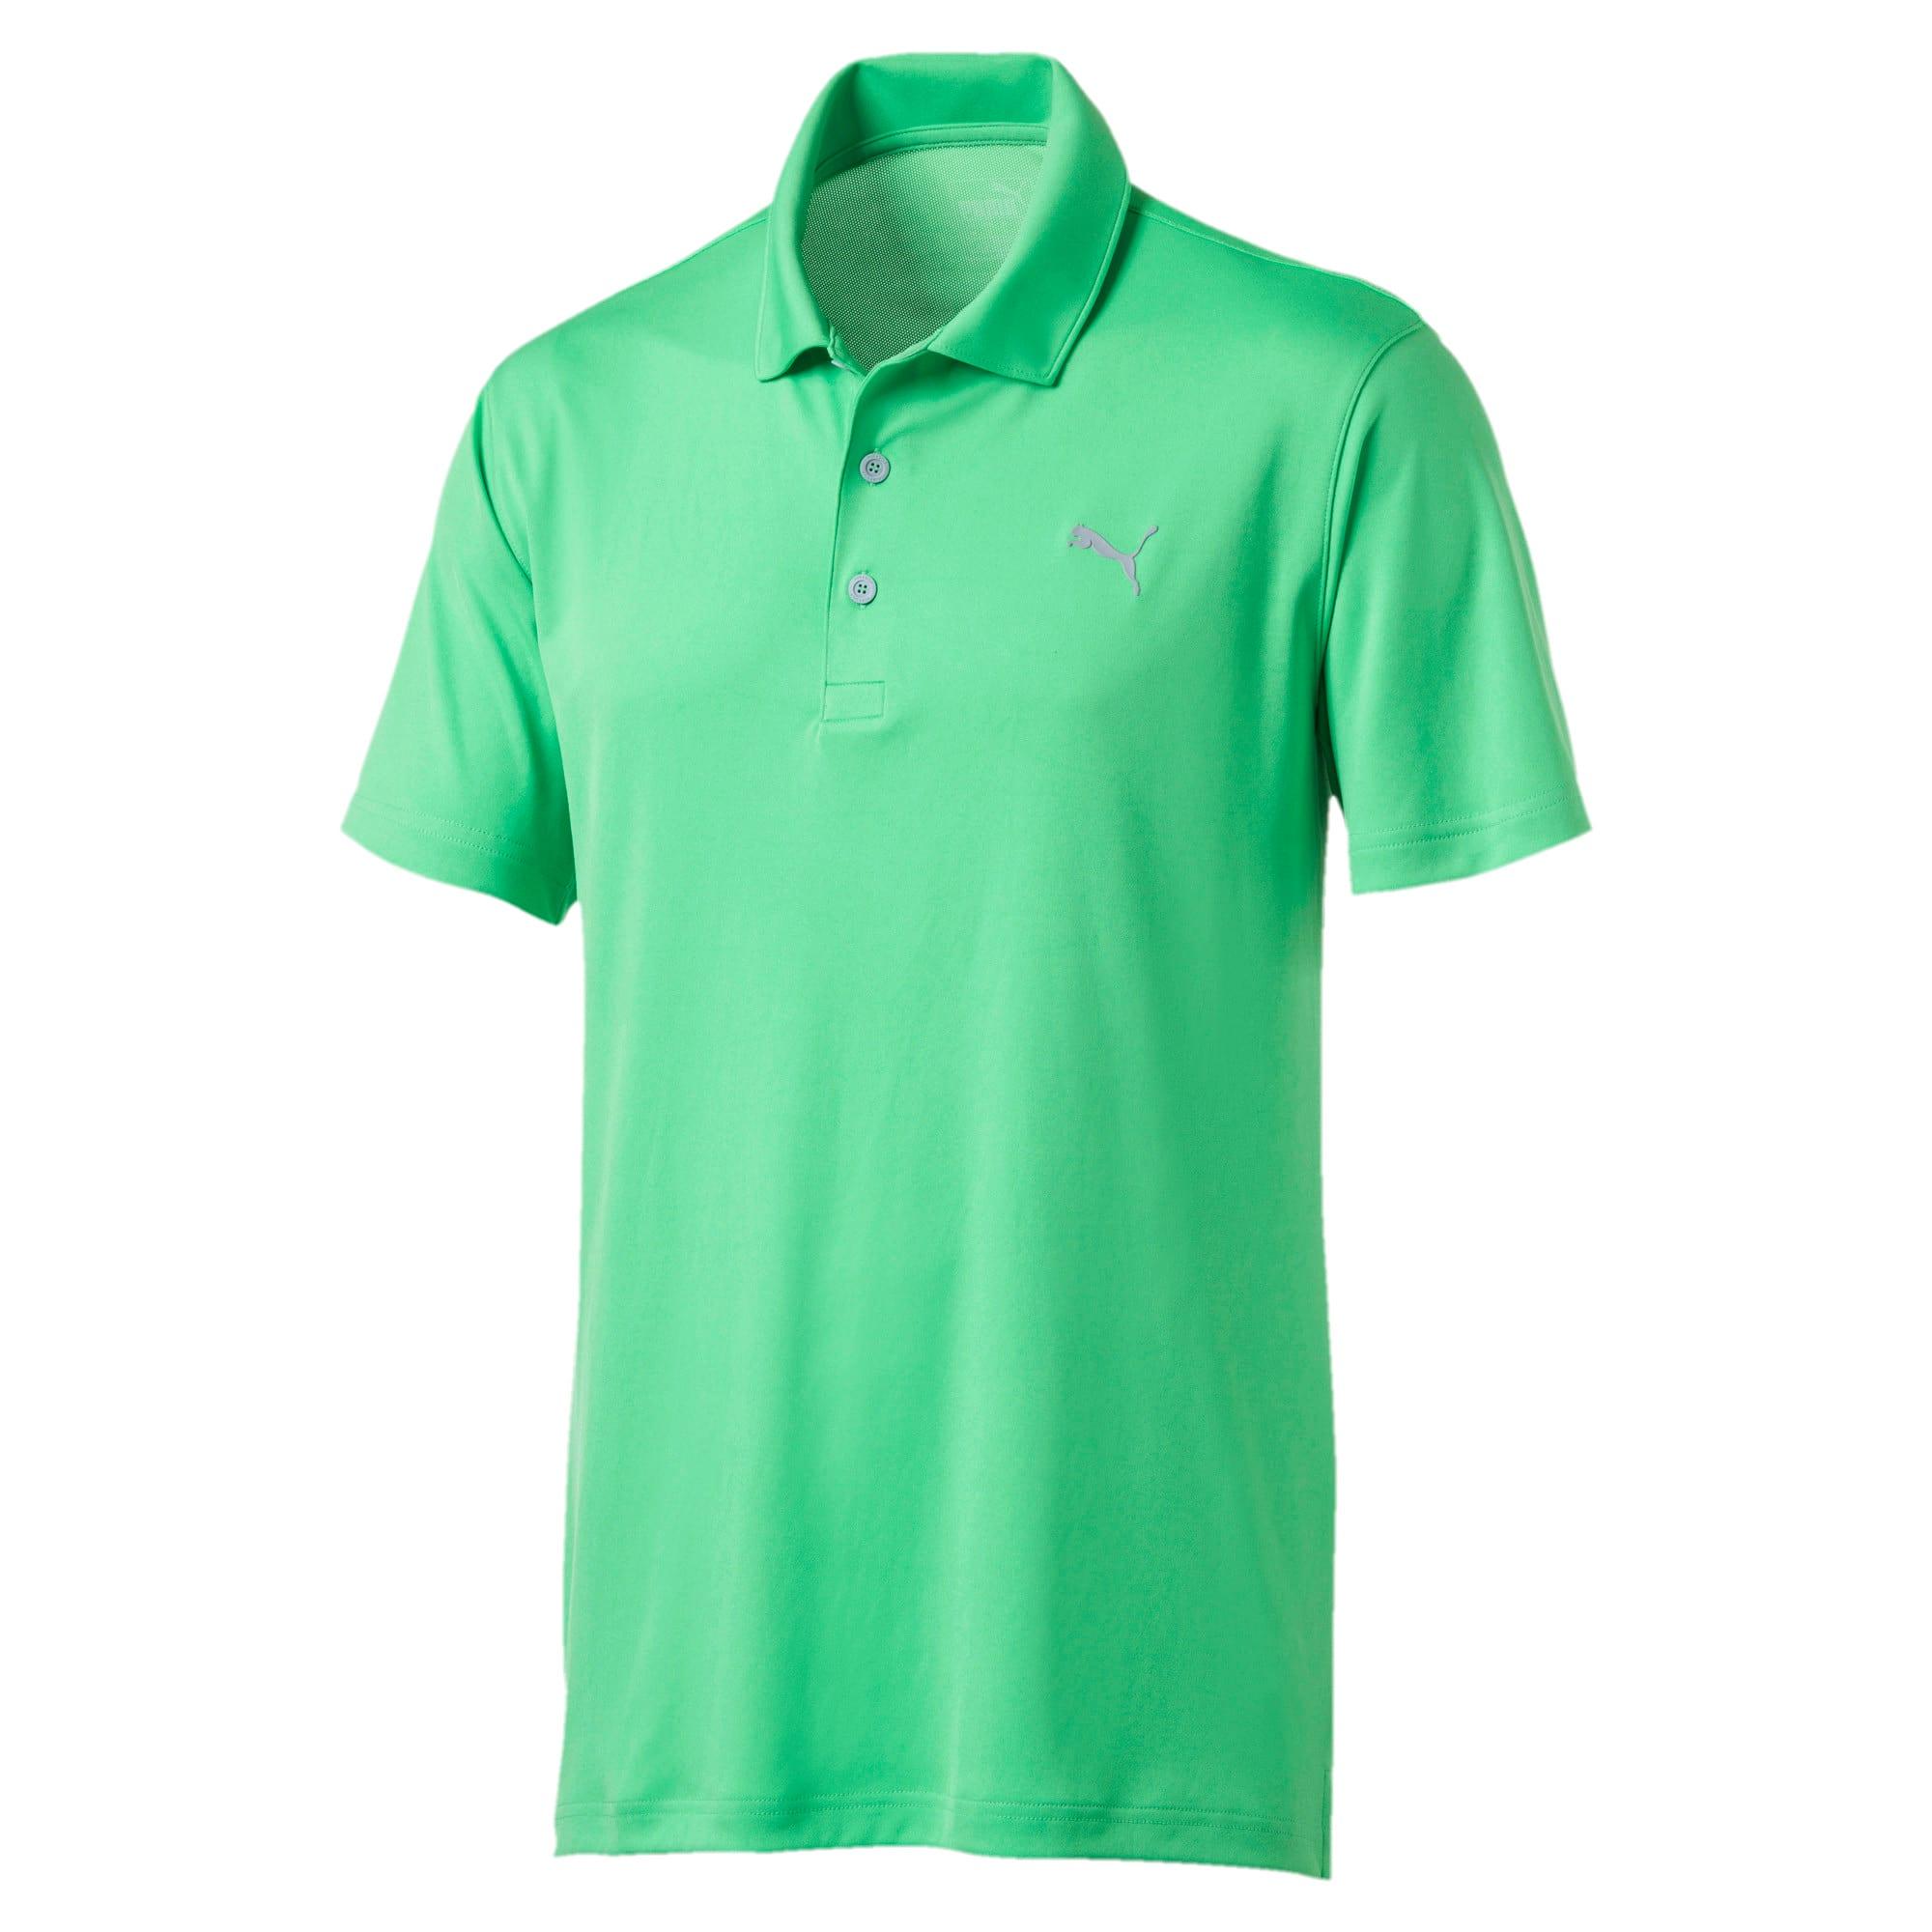 Thumbnail 4 of Rotation Golf poloshirt voor heren, Irish Green, medium